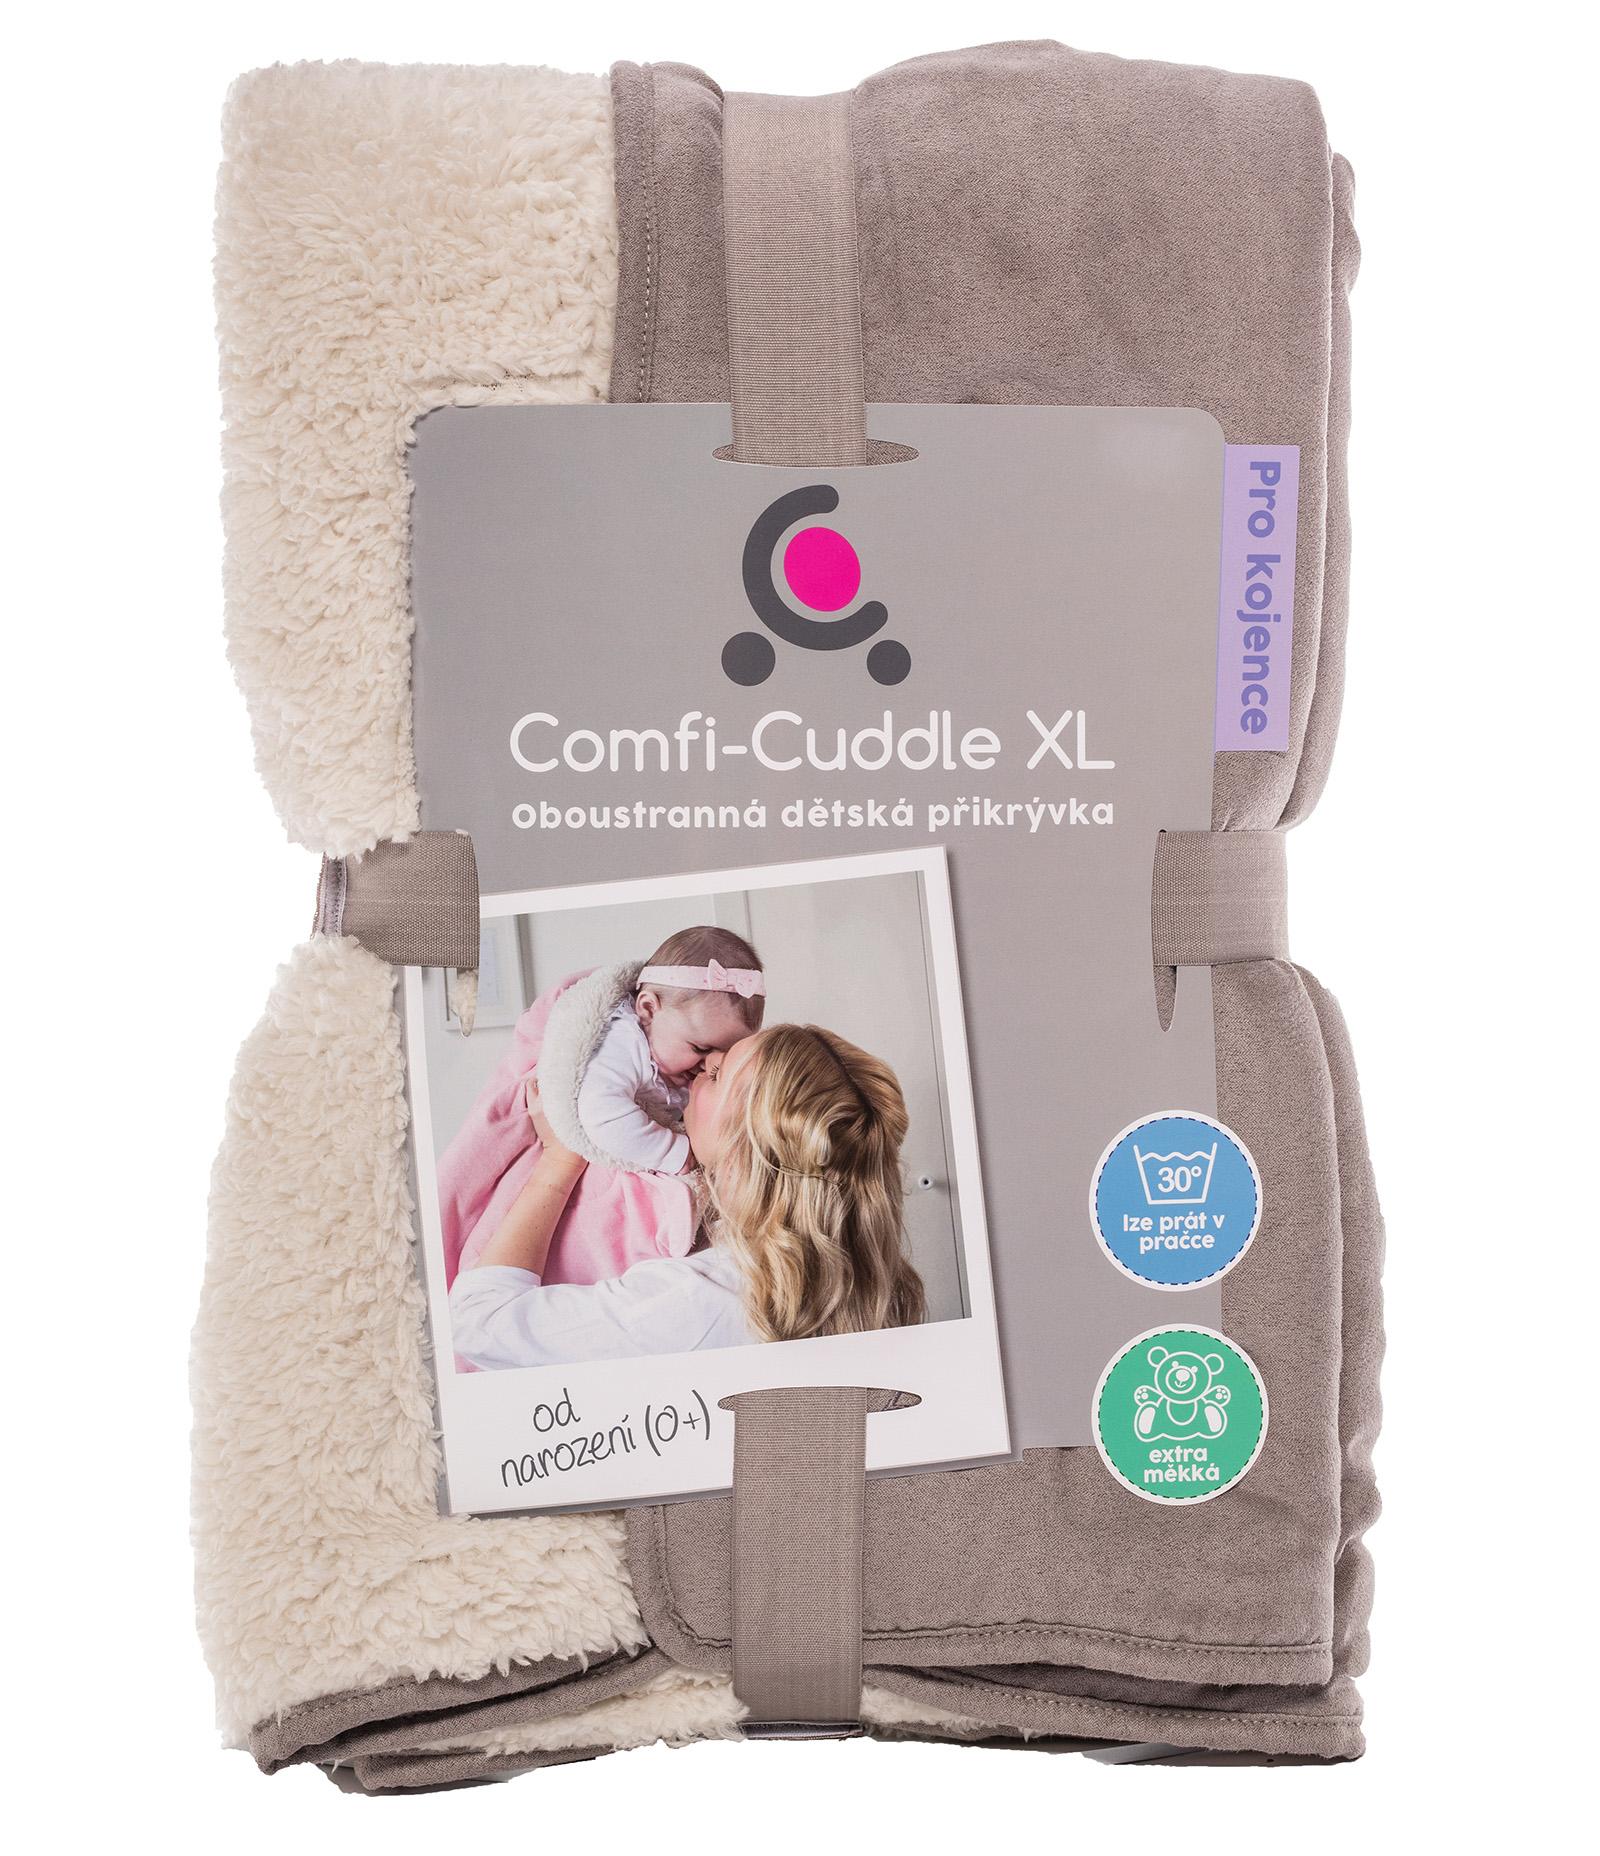 Dětská deka Comfi-Cuddle 140x100cm, Pebble